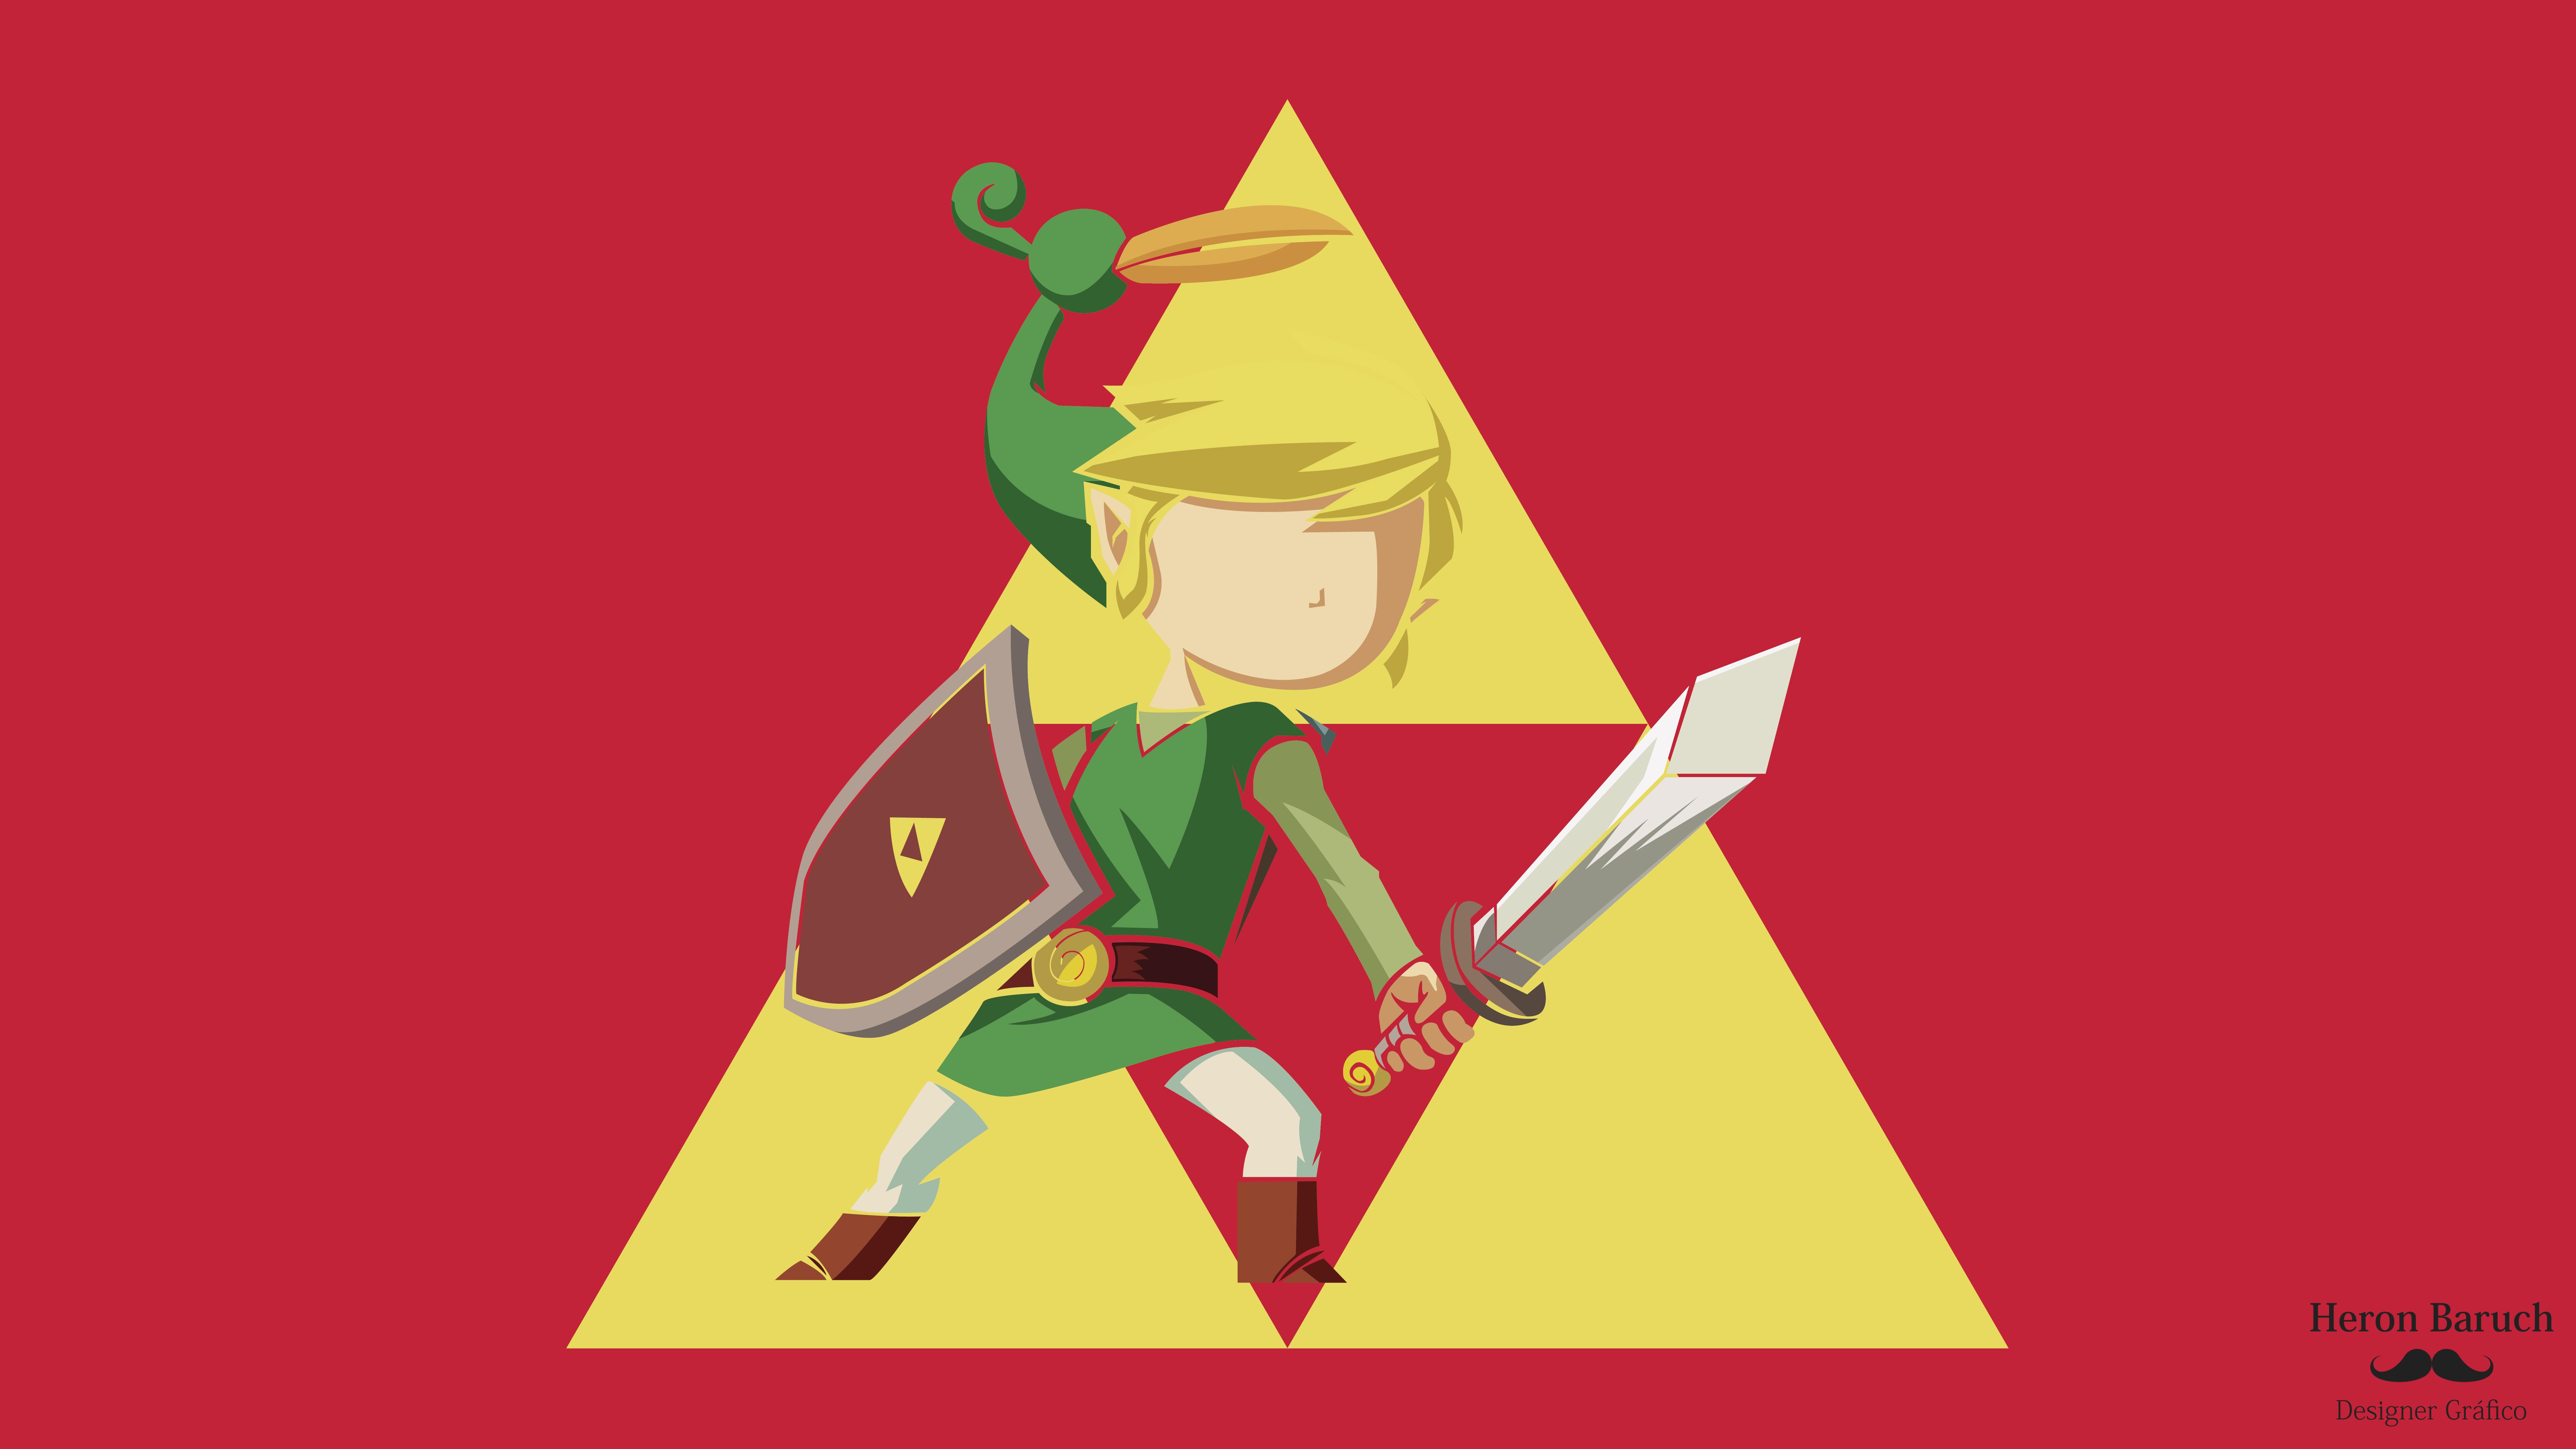 8000x4500 The Legend Of Zelda Minish Cap, Vector Art.